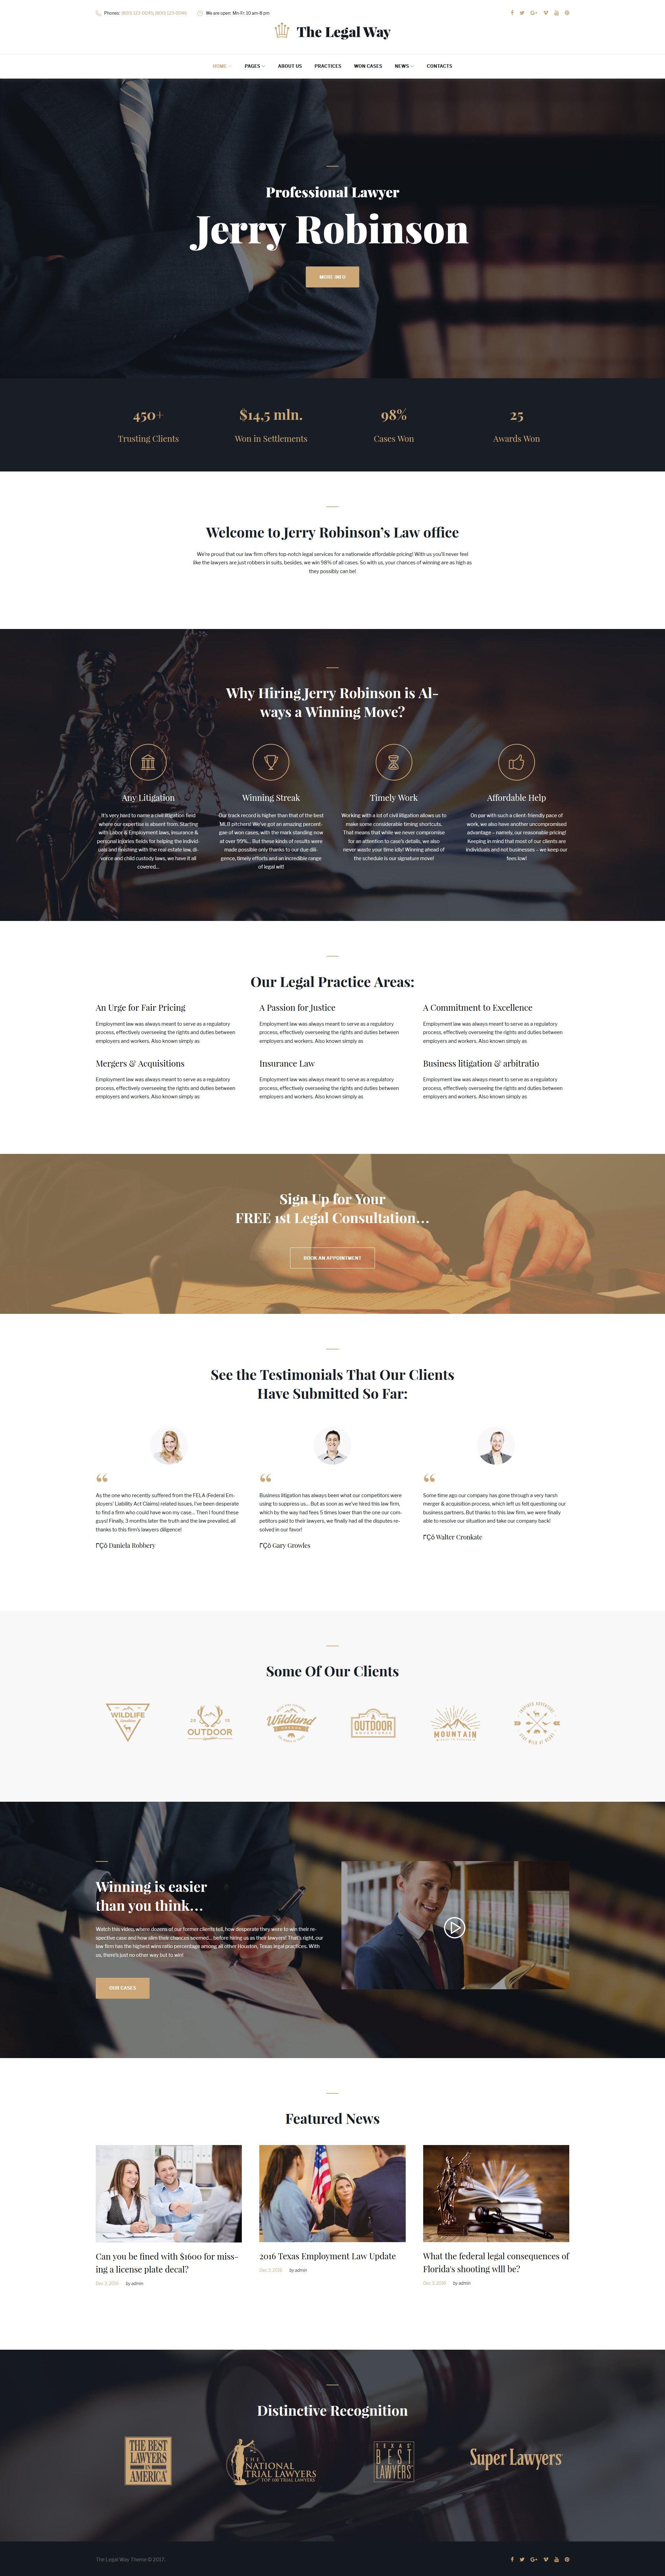 The Legal Way для сайта юриста №61148